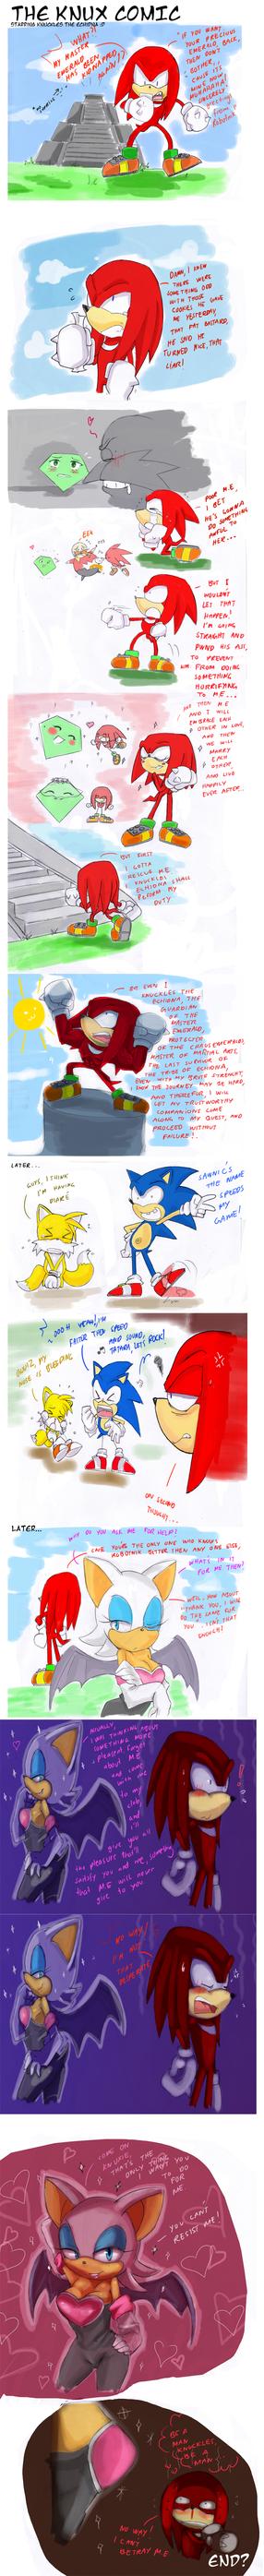 The Knux comic by missyuna